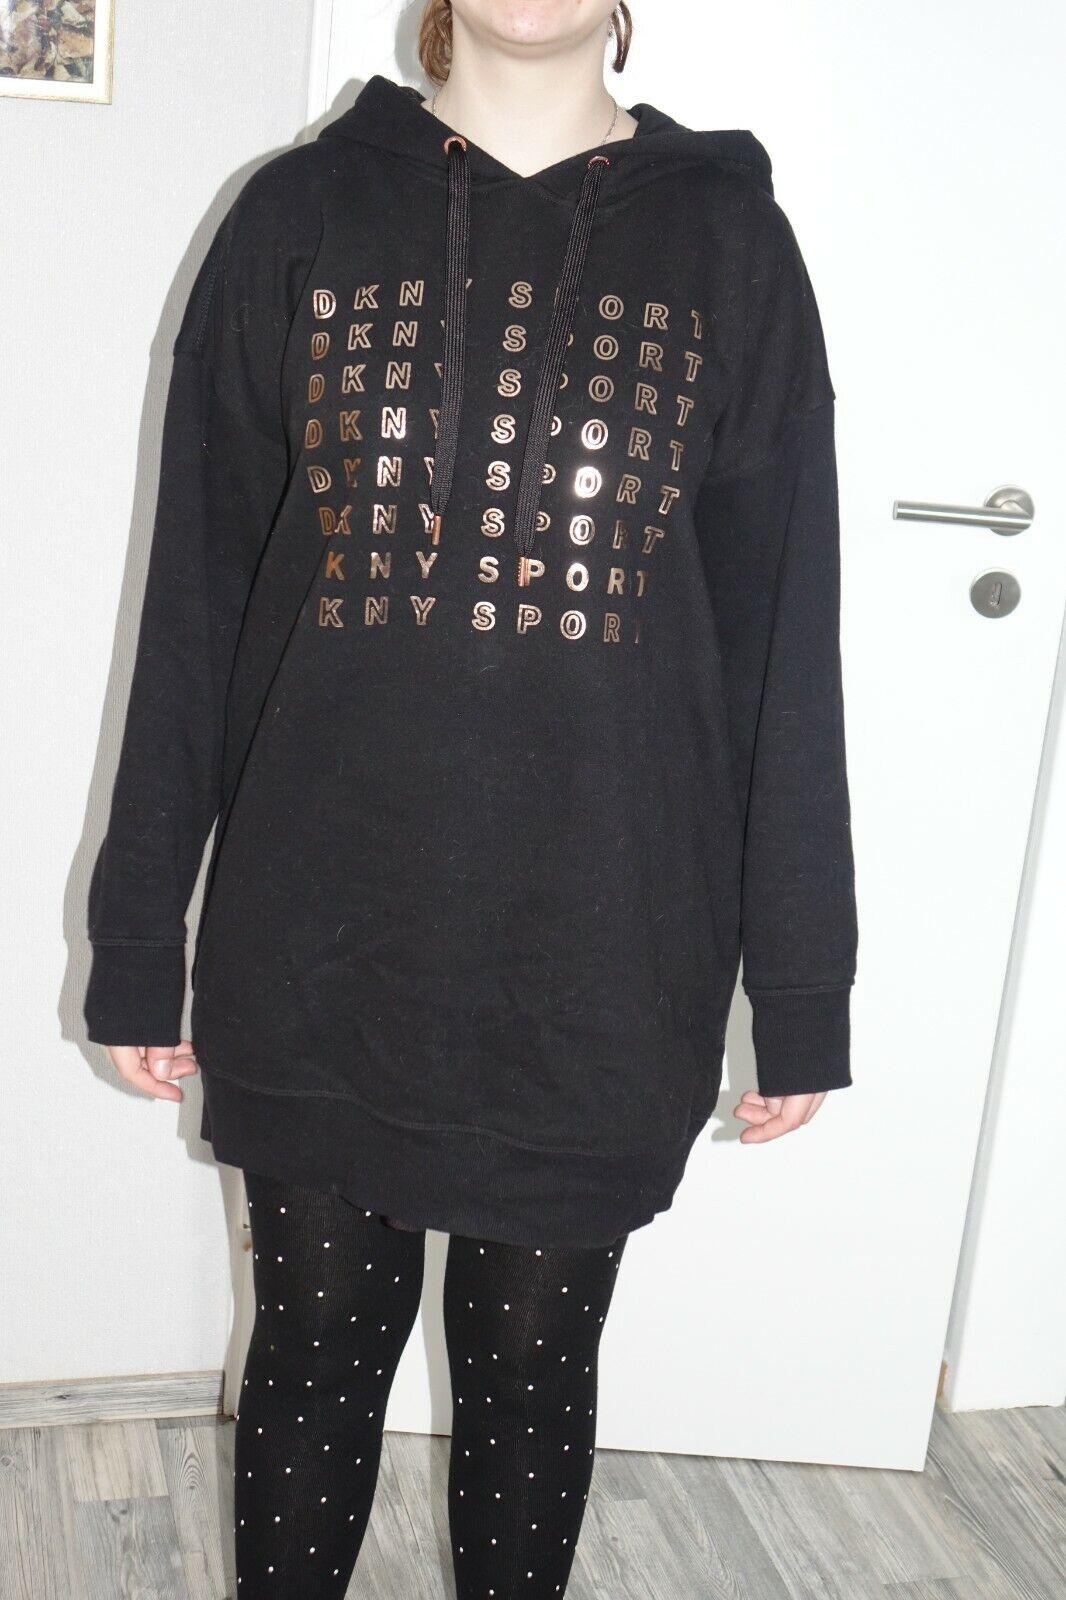 DKNY Kapuzenpullover Longpullover Hoodie Pullover schwarz Gr. S